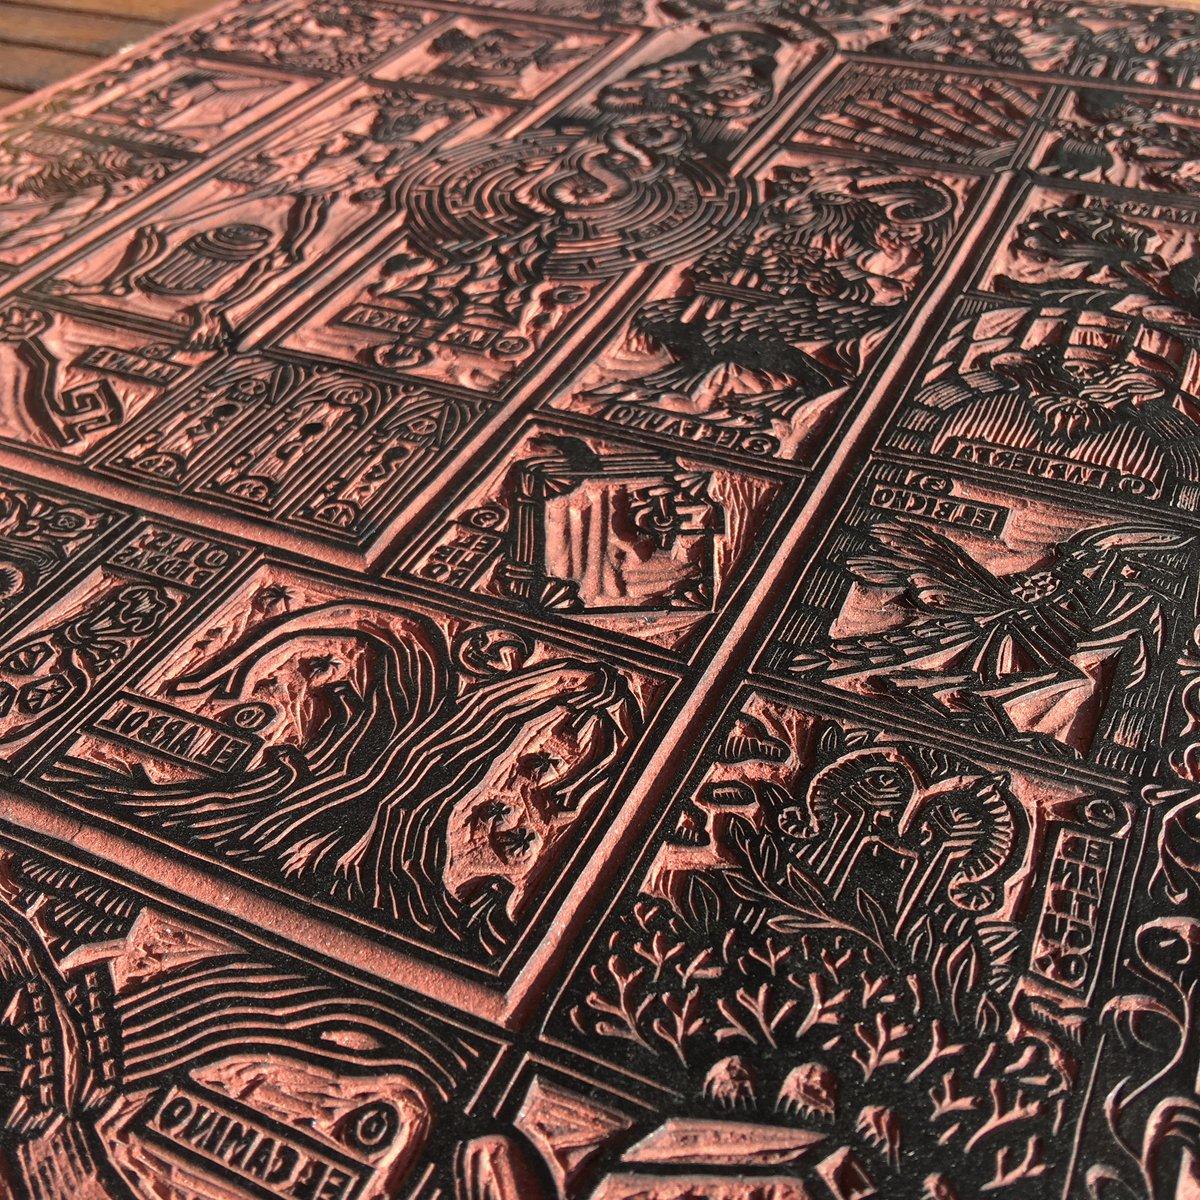 Image of Pan's Labyrinth